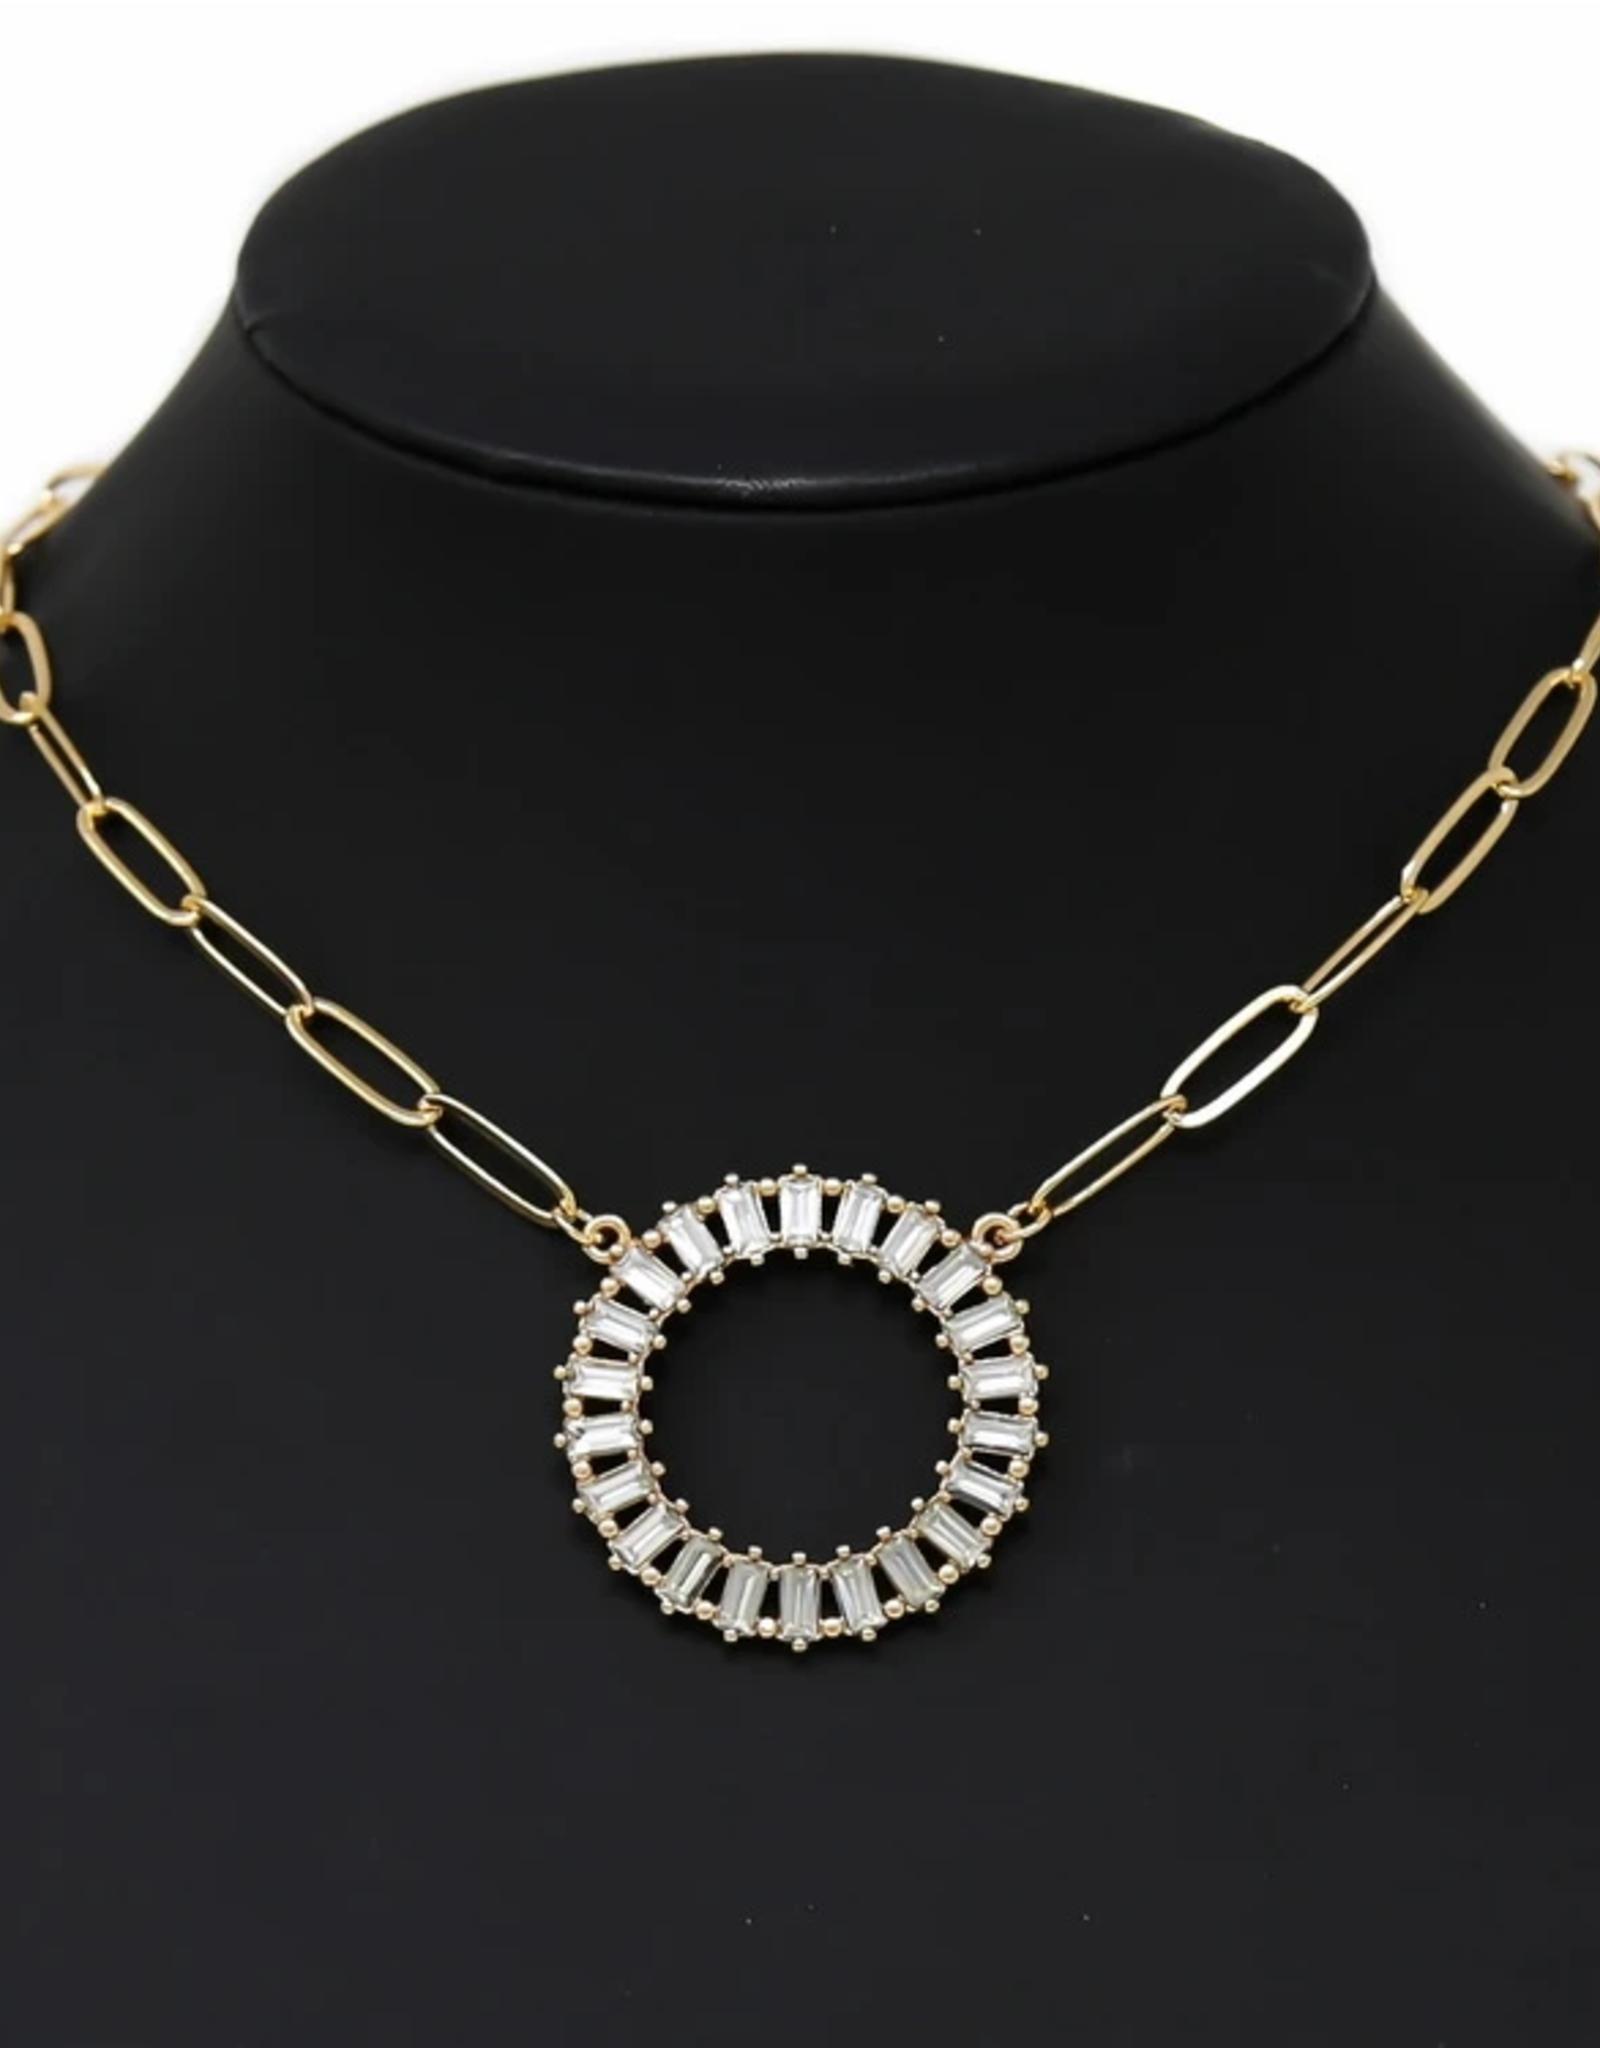 Blue Suede Jewels Emerald Cut Stone Pave Circle Pendant Short Chain Necklace